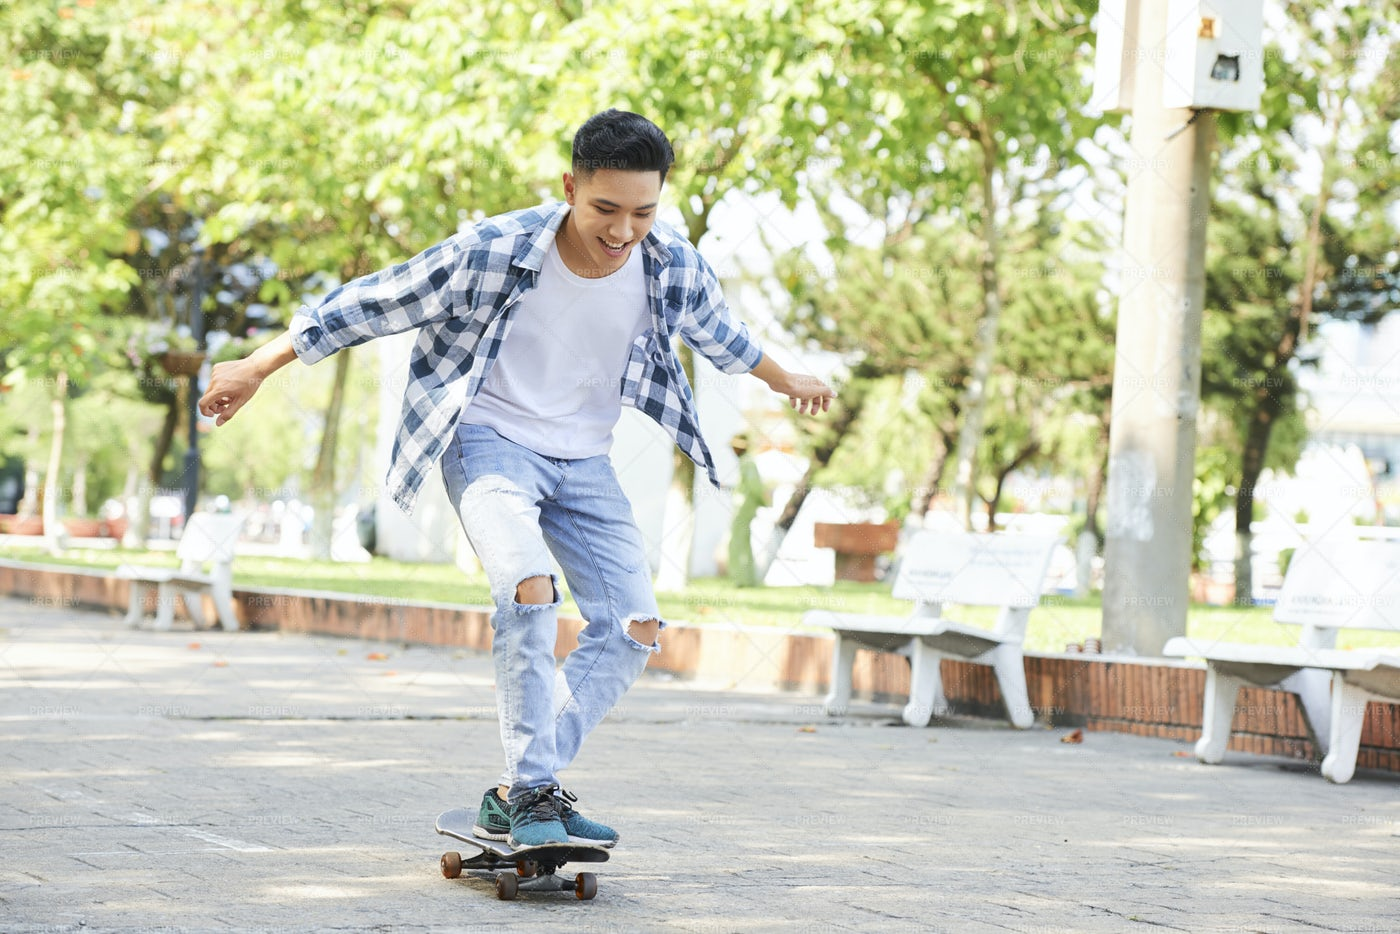 Yong Trendy Man Having Fun With: Stock Photos